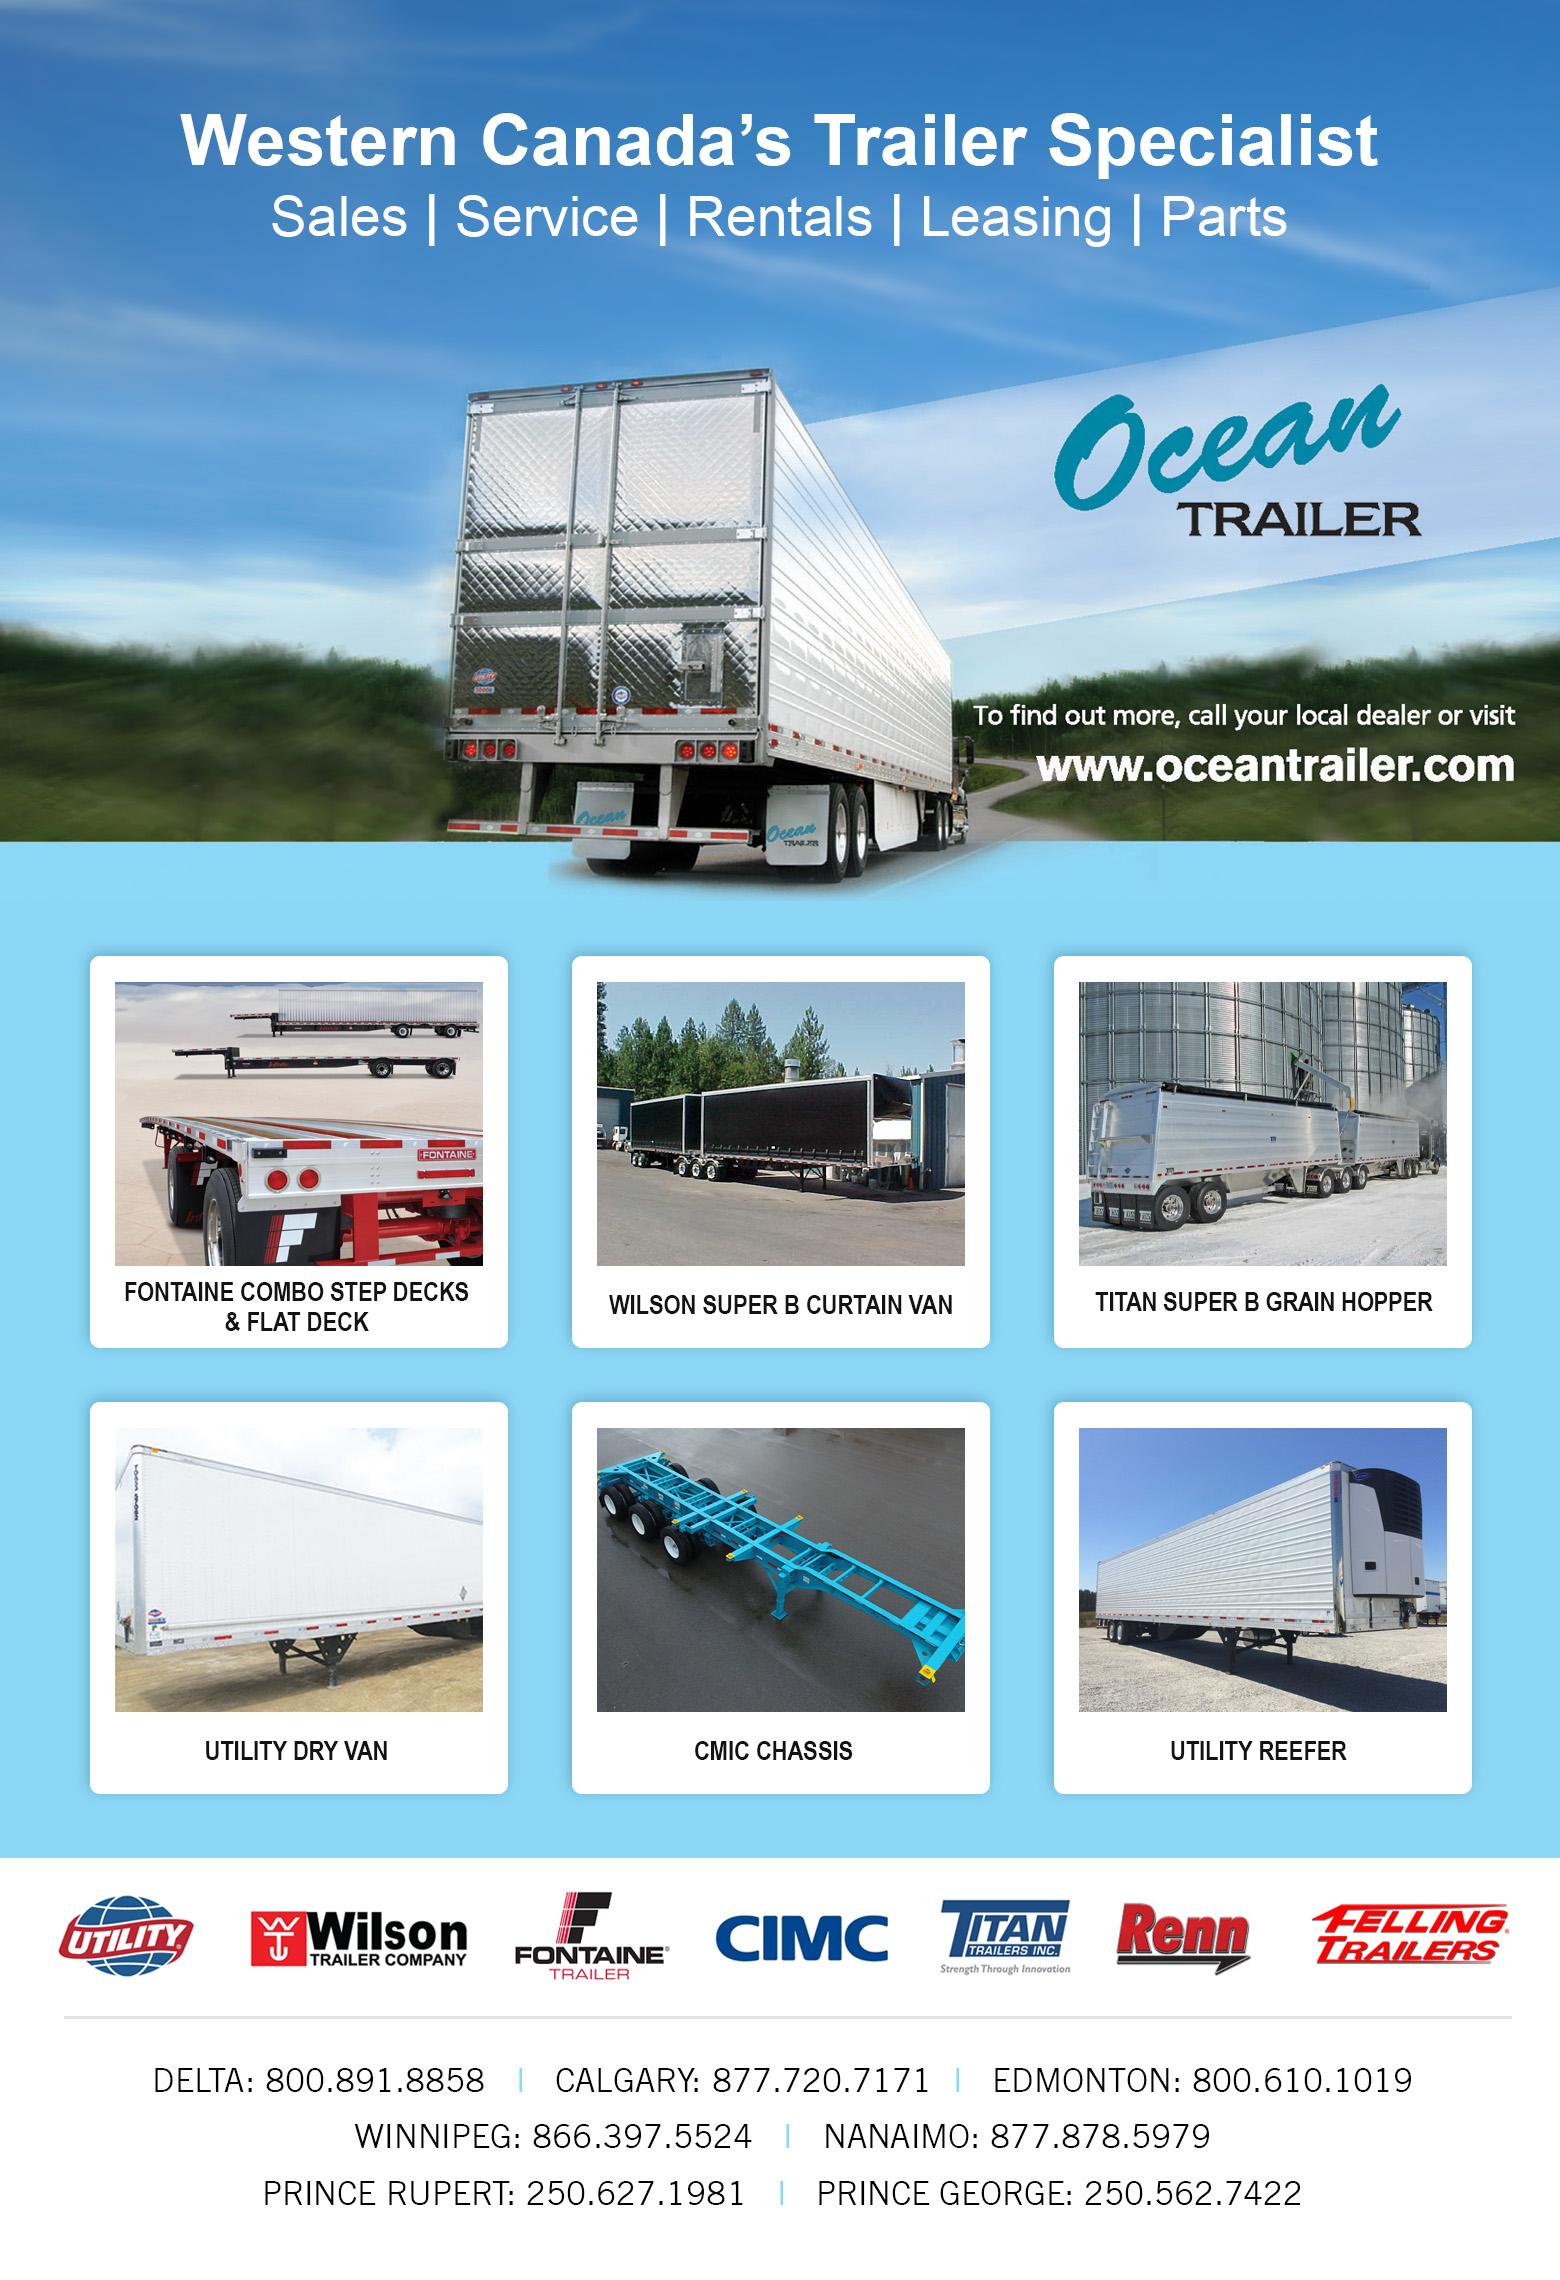 ocean-trailer-swQZGtK.jpeg